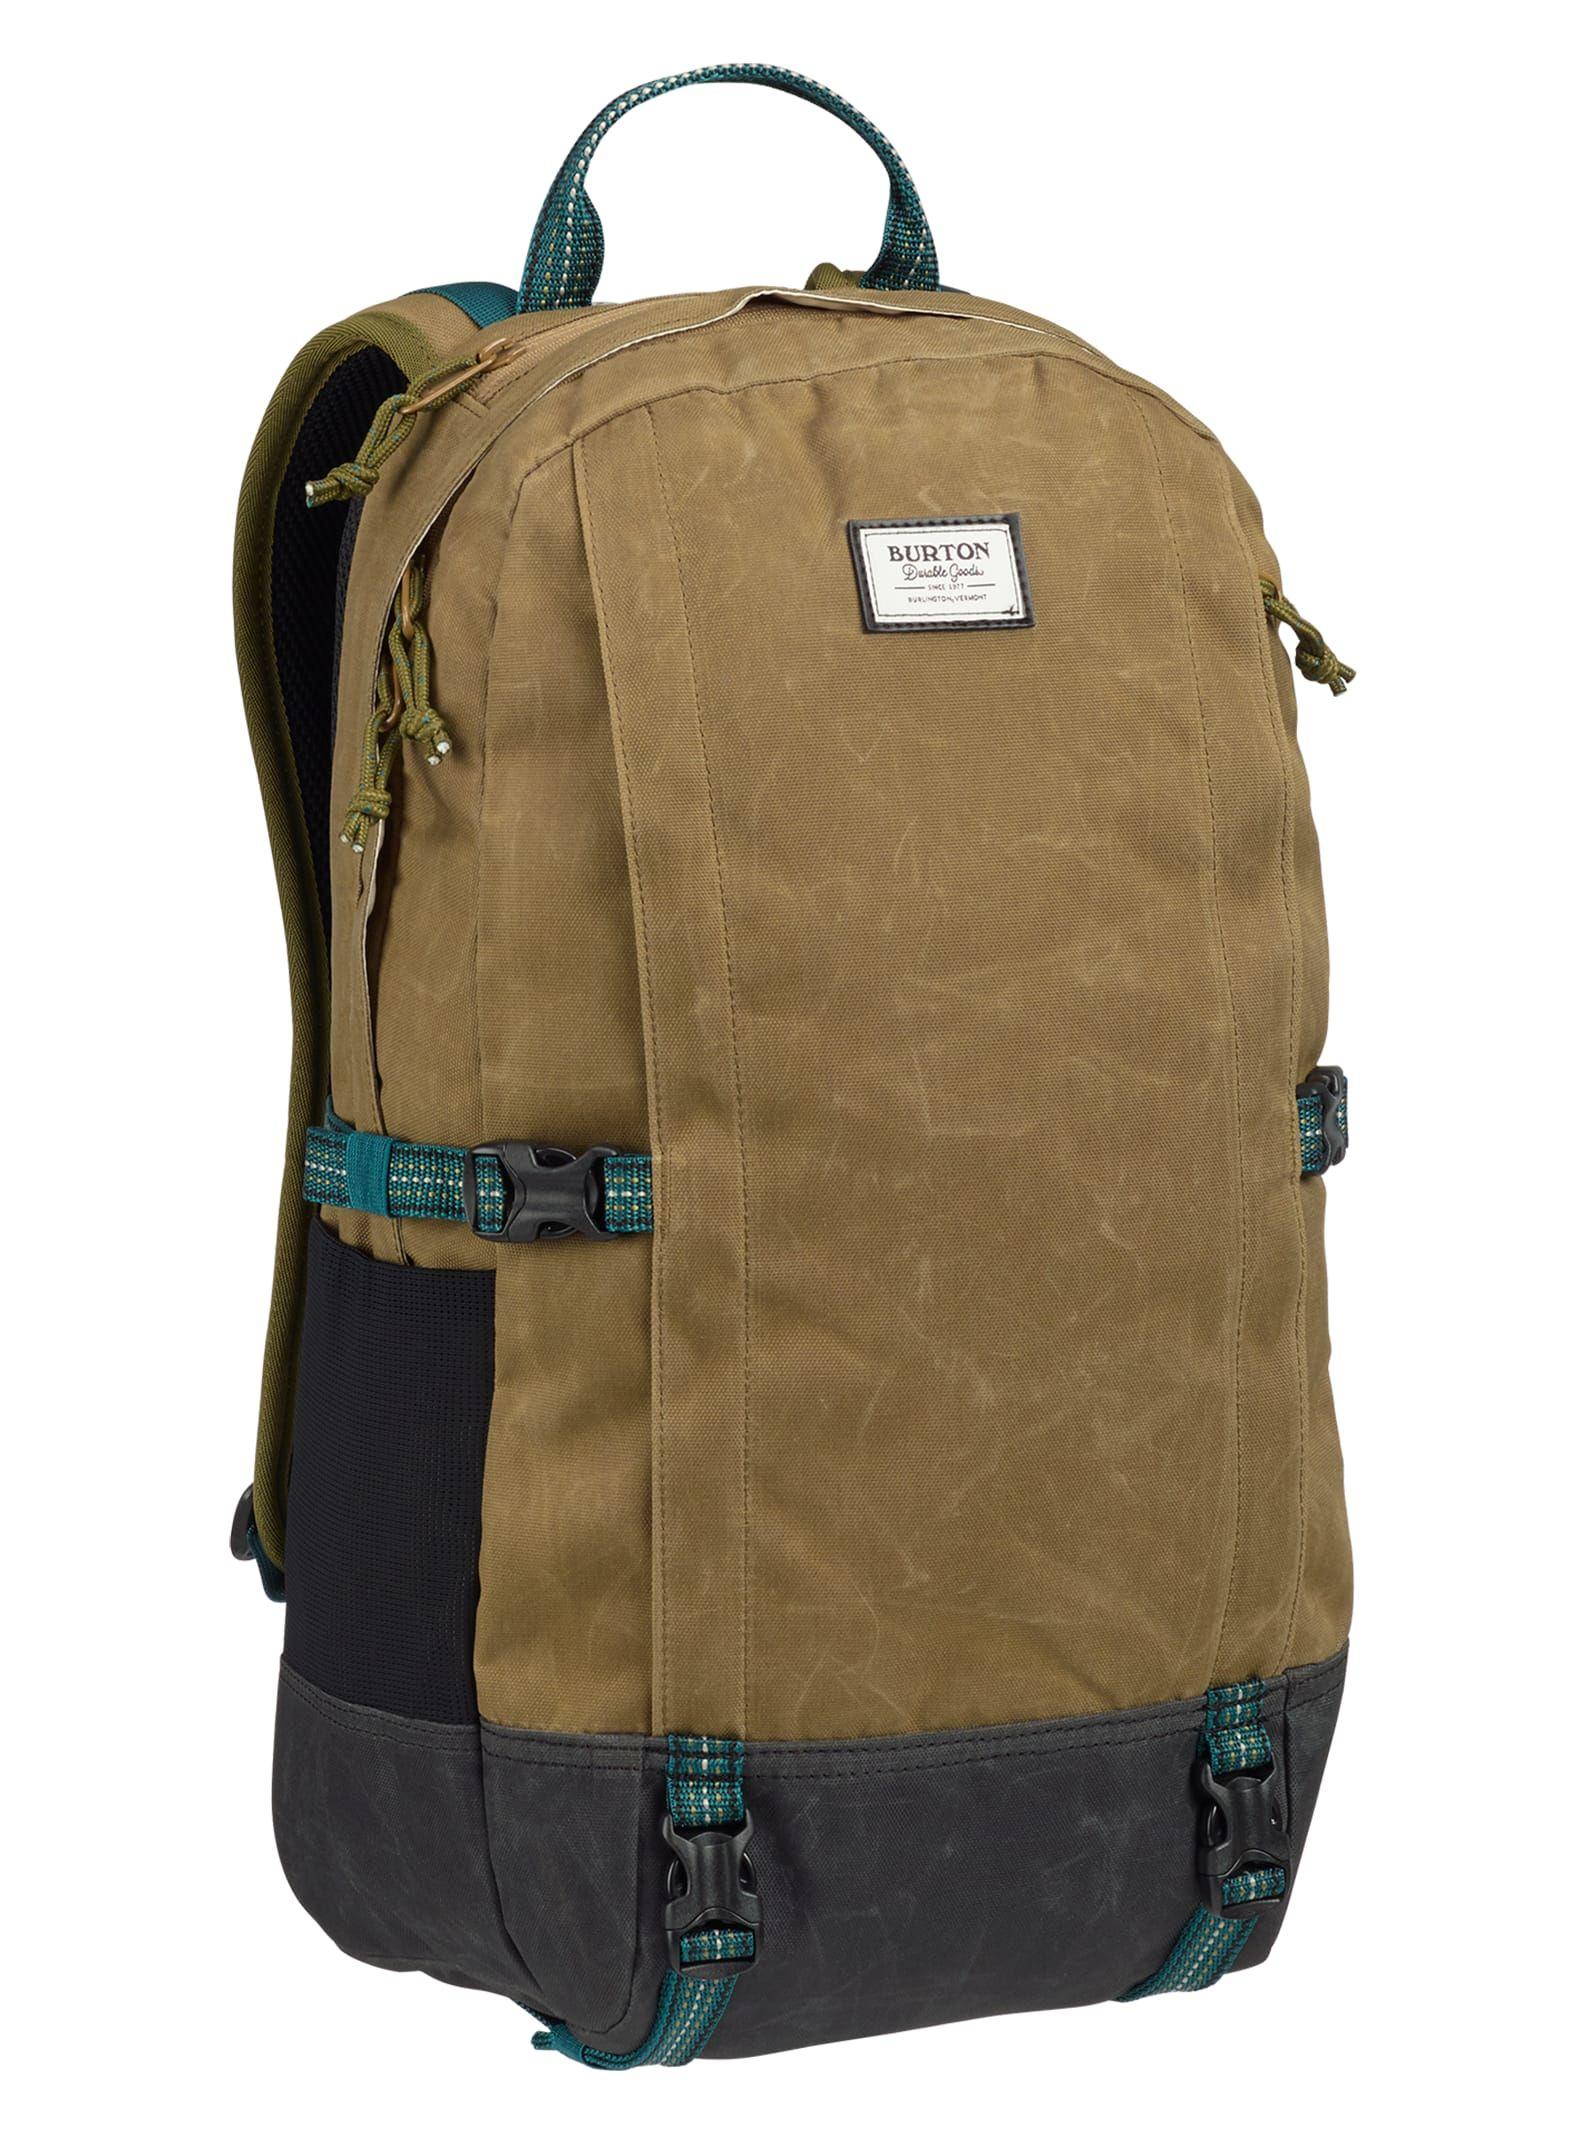 212d5549e4 ... duffel bags and snowboarding gear bags. Burton Sleyton Backpack